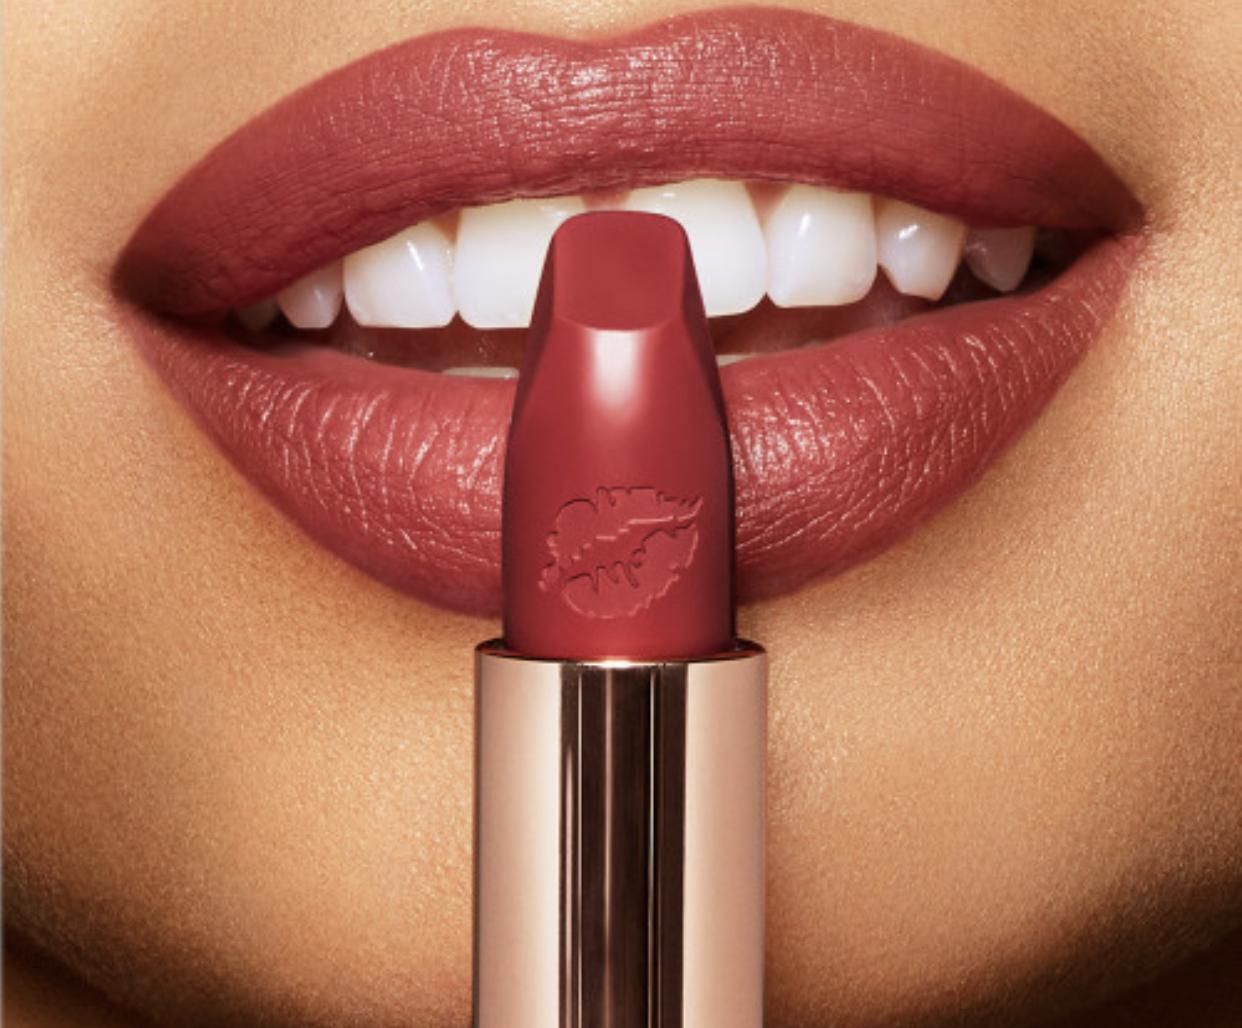 Charlotte Tilbury Mini Hot Lips Charms trio